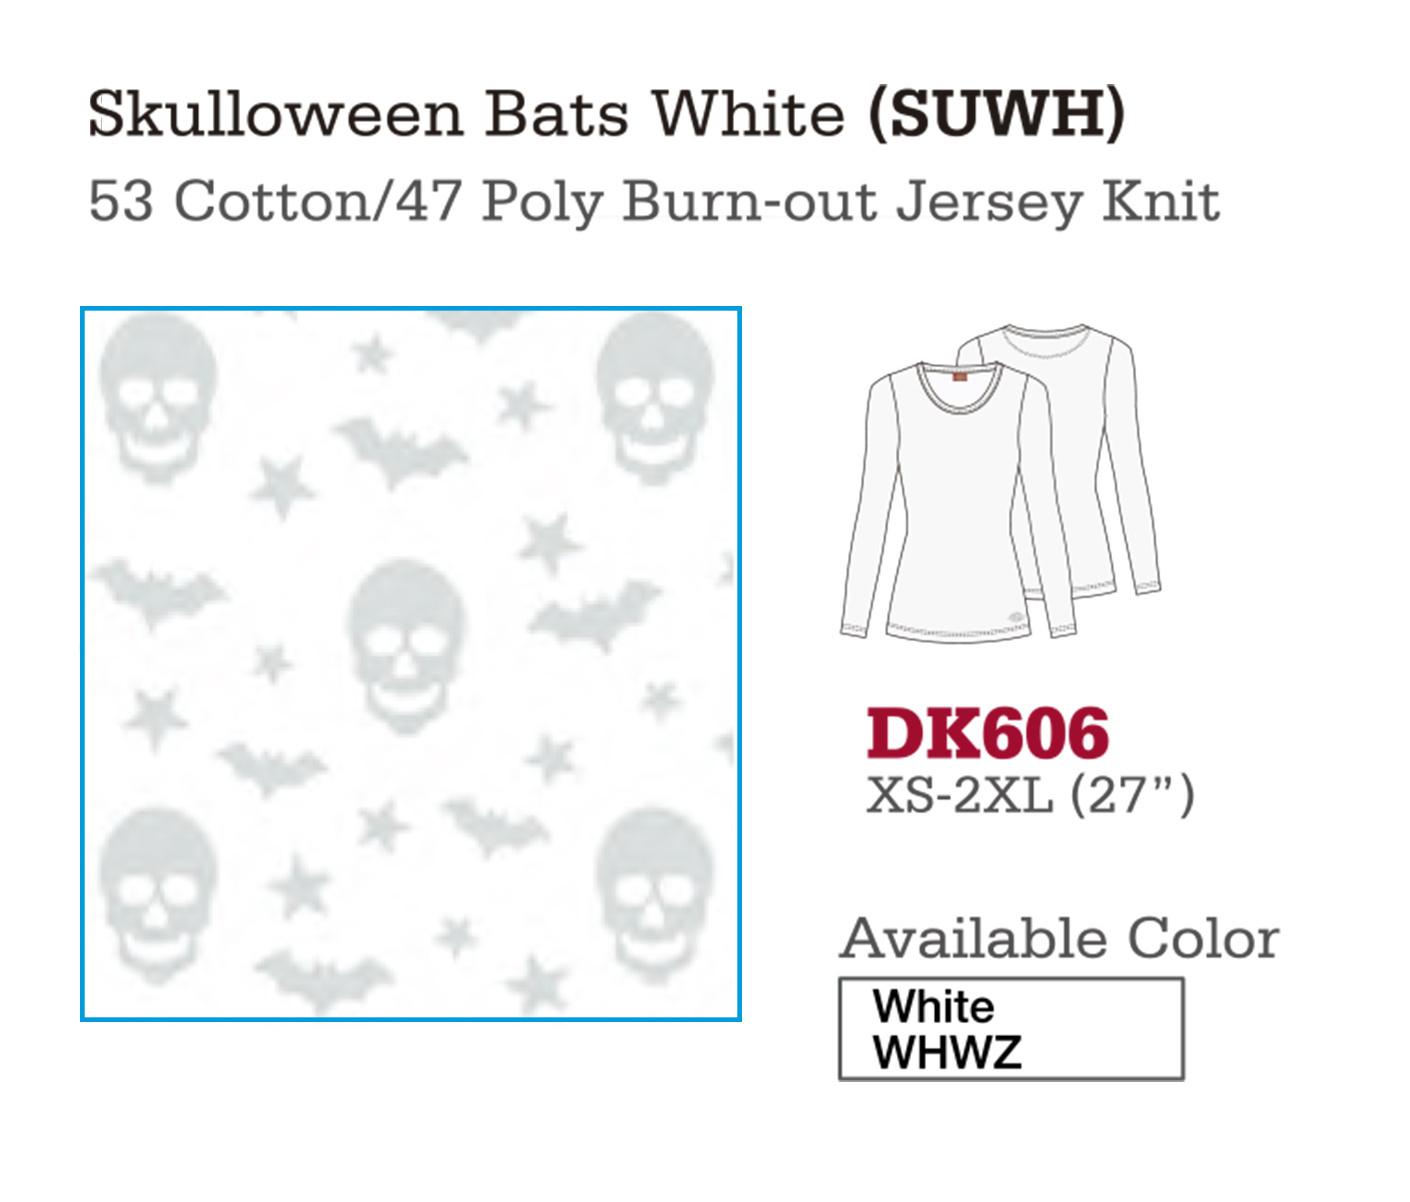 Skulloween Bats White. DK606.